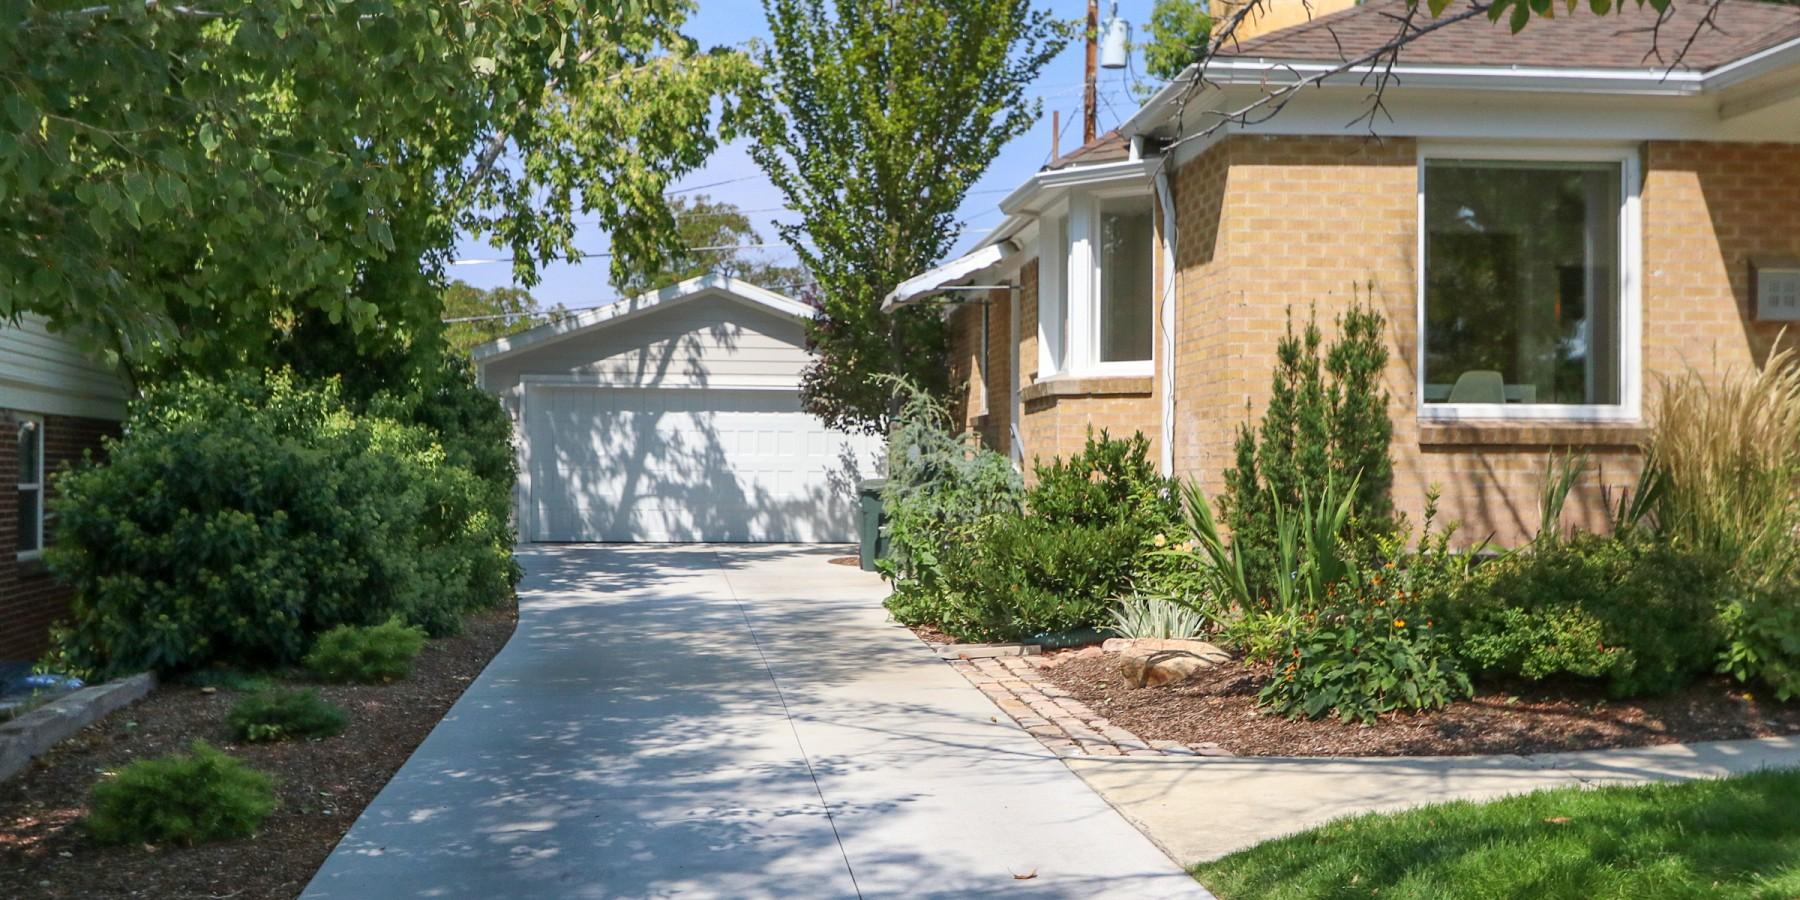 2507 E. Wilmington Avenue, Salt Lake City, UT 84109